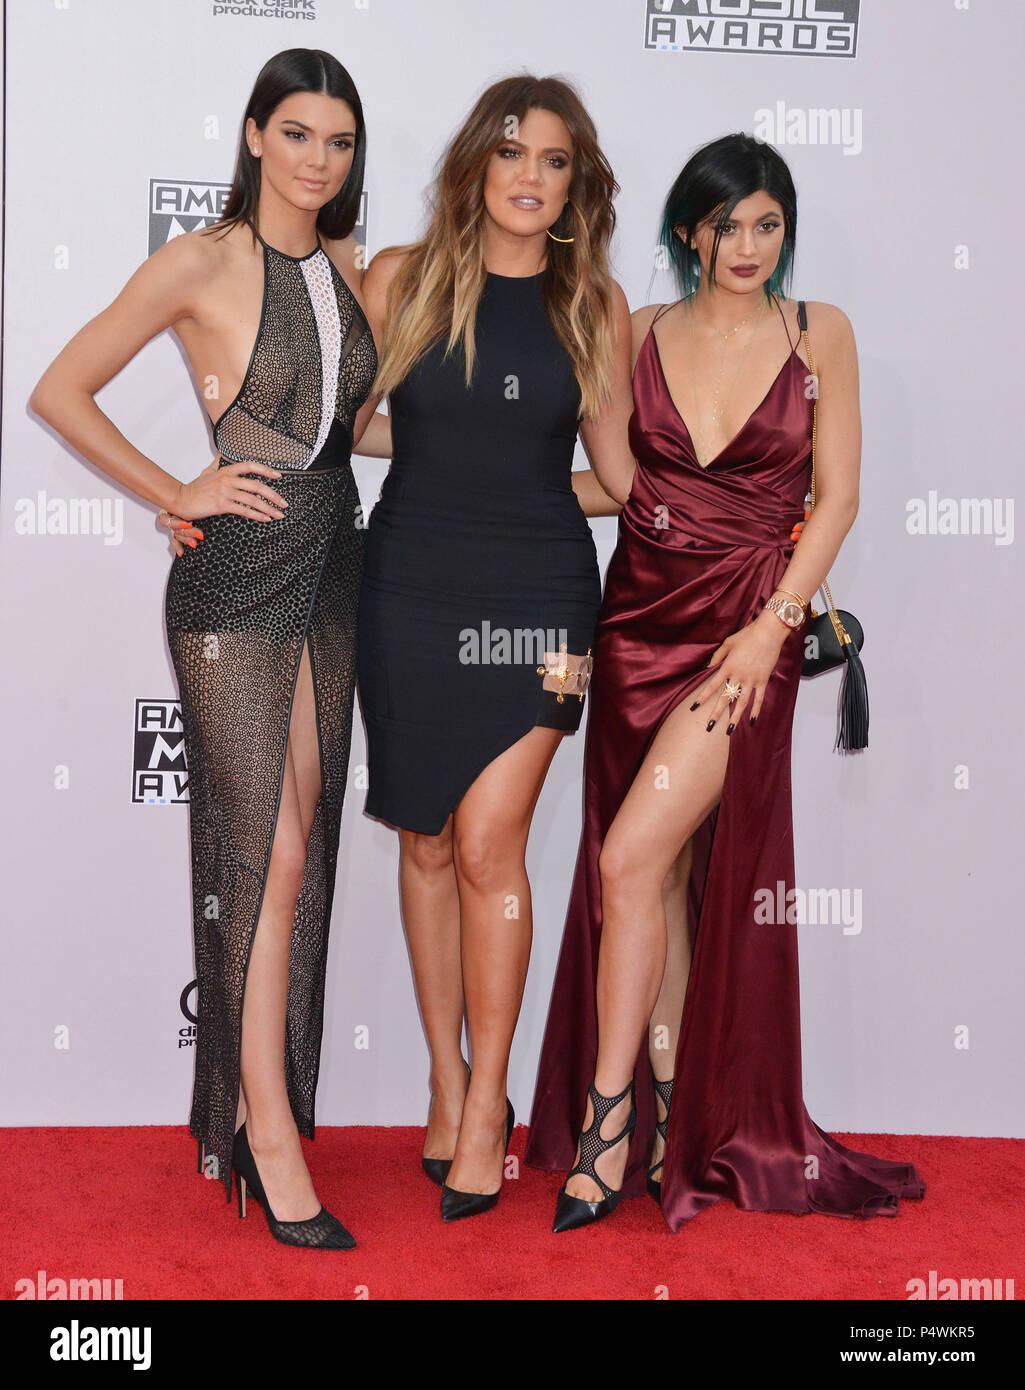 Celebrites Kylie Jenner Kendall Jenner nudes (22 photo), Pussy, Bikini, Boobs, bra 2020